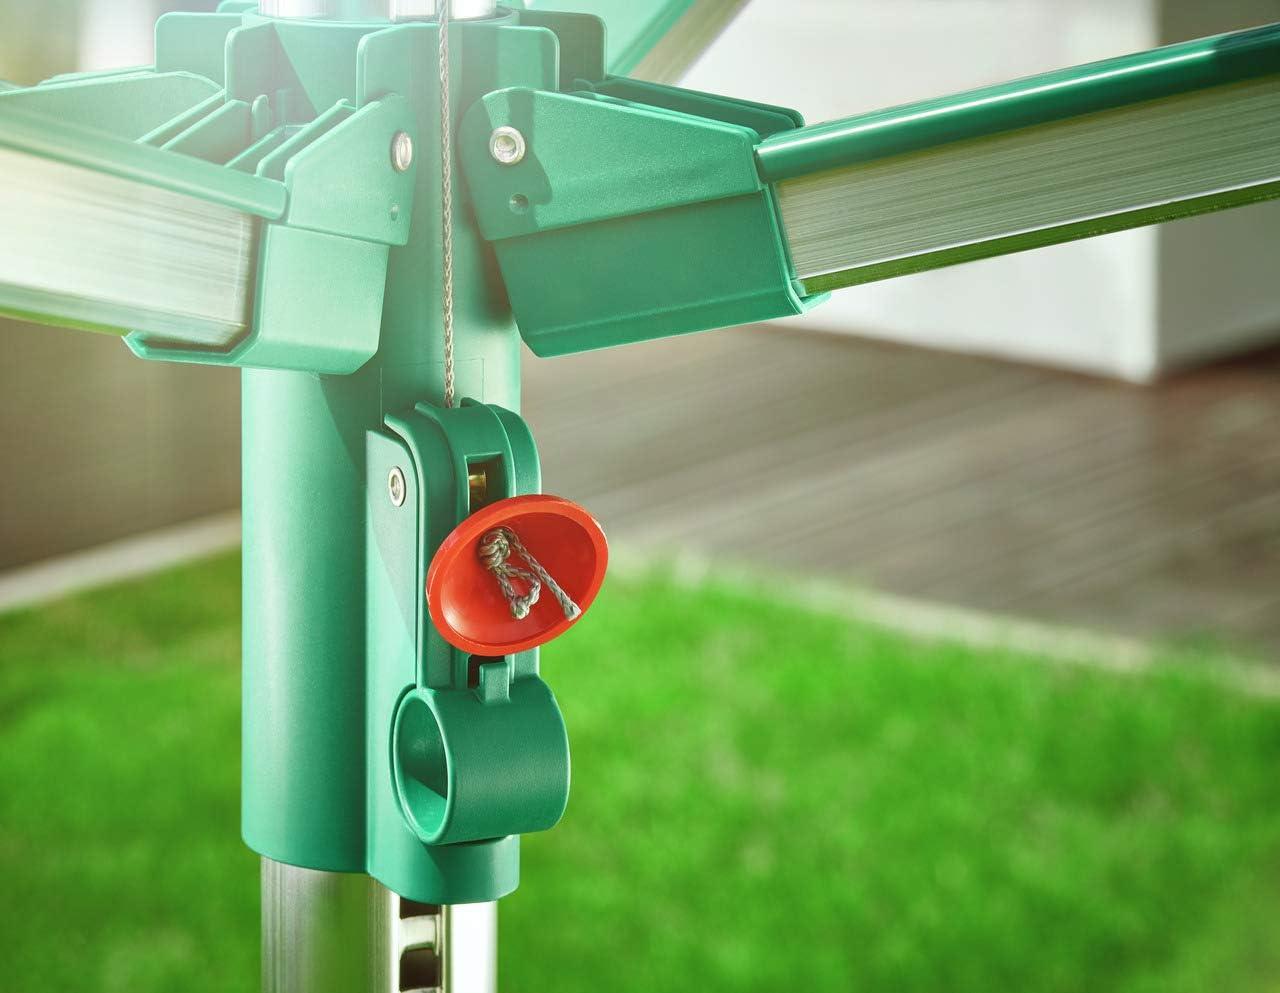 231x16.5x16.5 cm Leifheit Linomatic 500 Comfort Tendedero Verde Met/álico